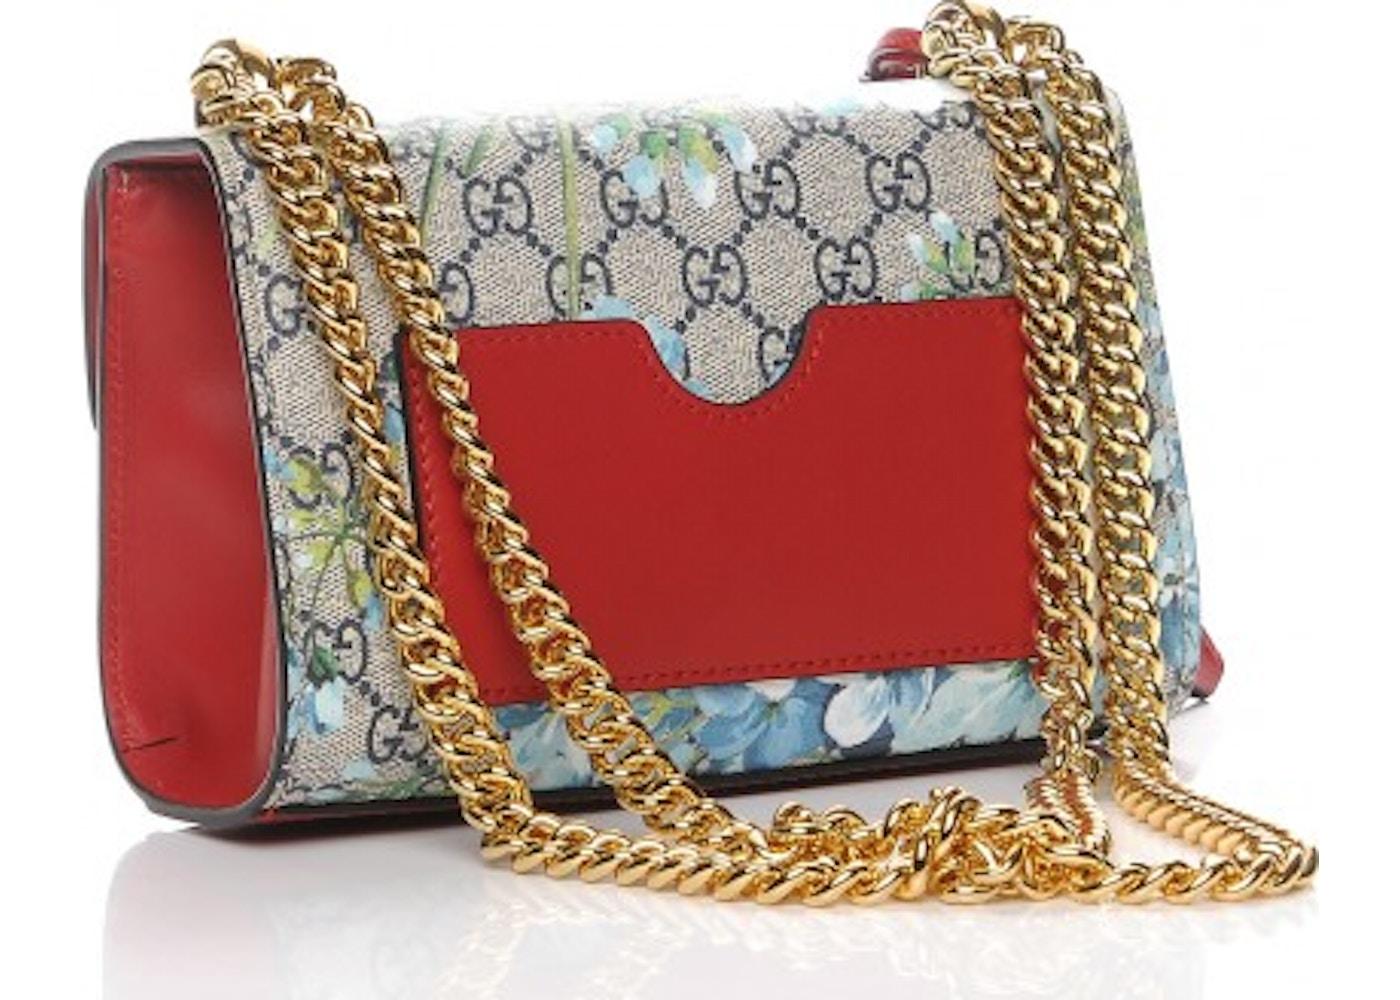 1c4b68d5c61e Gucci Padlock Shoulder Bag Blooms GG Supreme Small Blue/Red/Beige